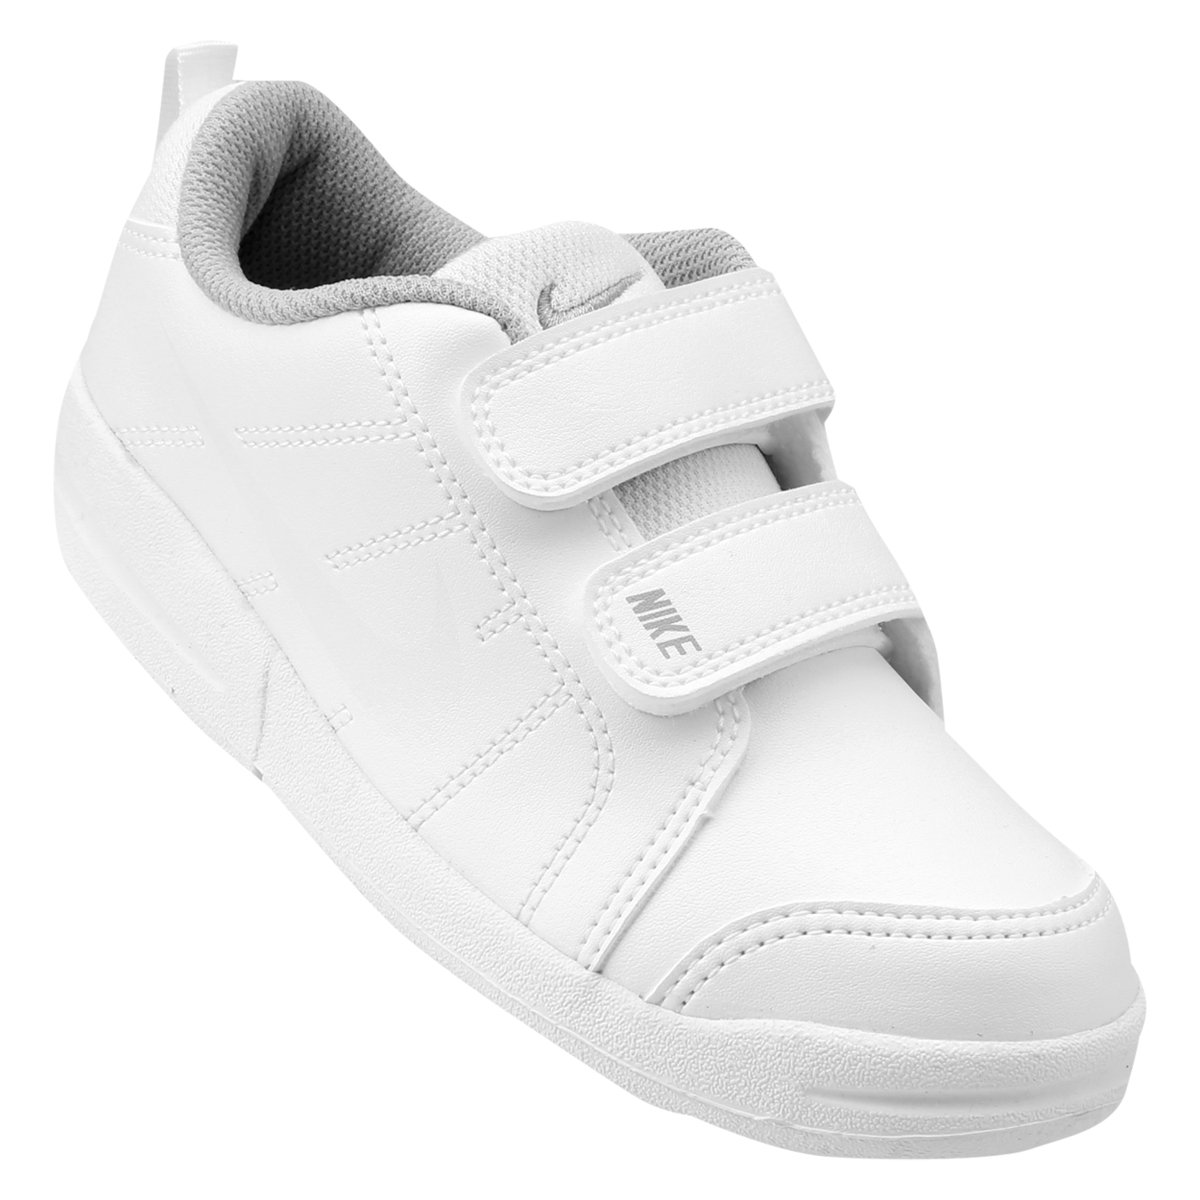 4f35c659f2f Tênis Infantil Nike Pico Lt - Branco e Cinza - Compre Agora